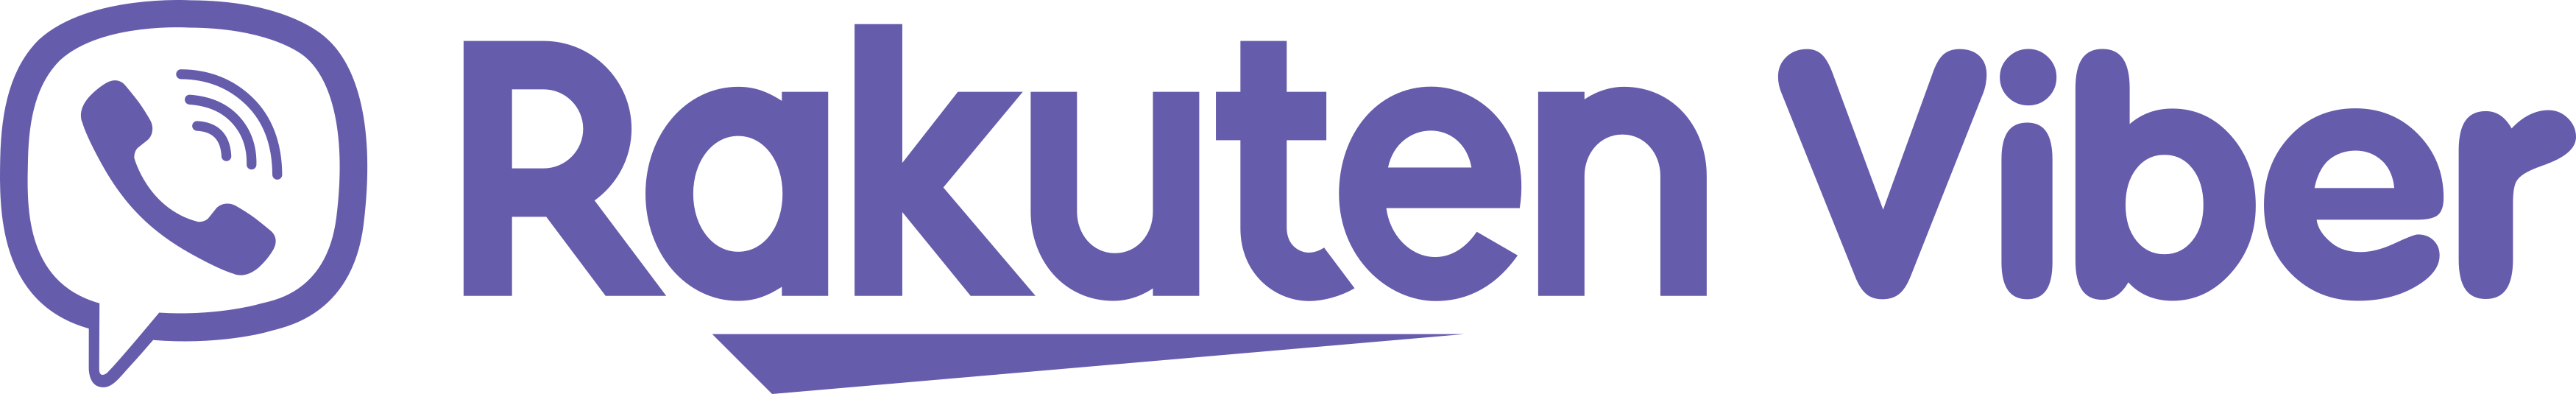 viber logo icon 3 - Rakuten Viber Logo - Icon